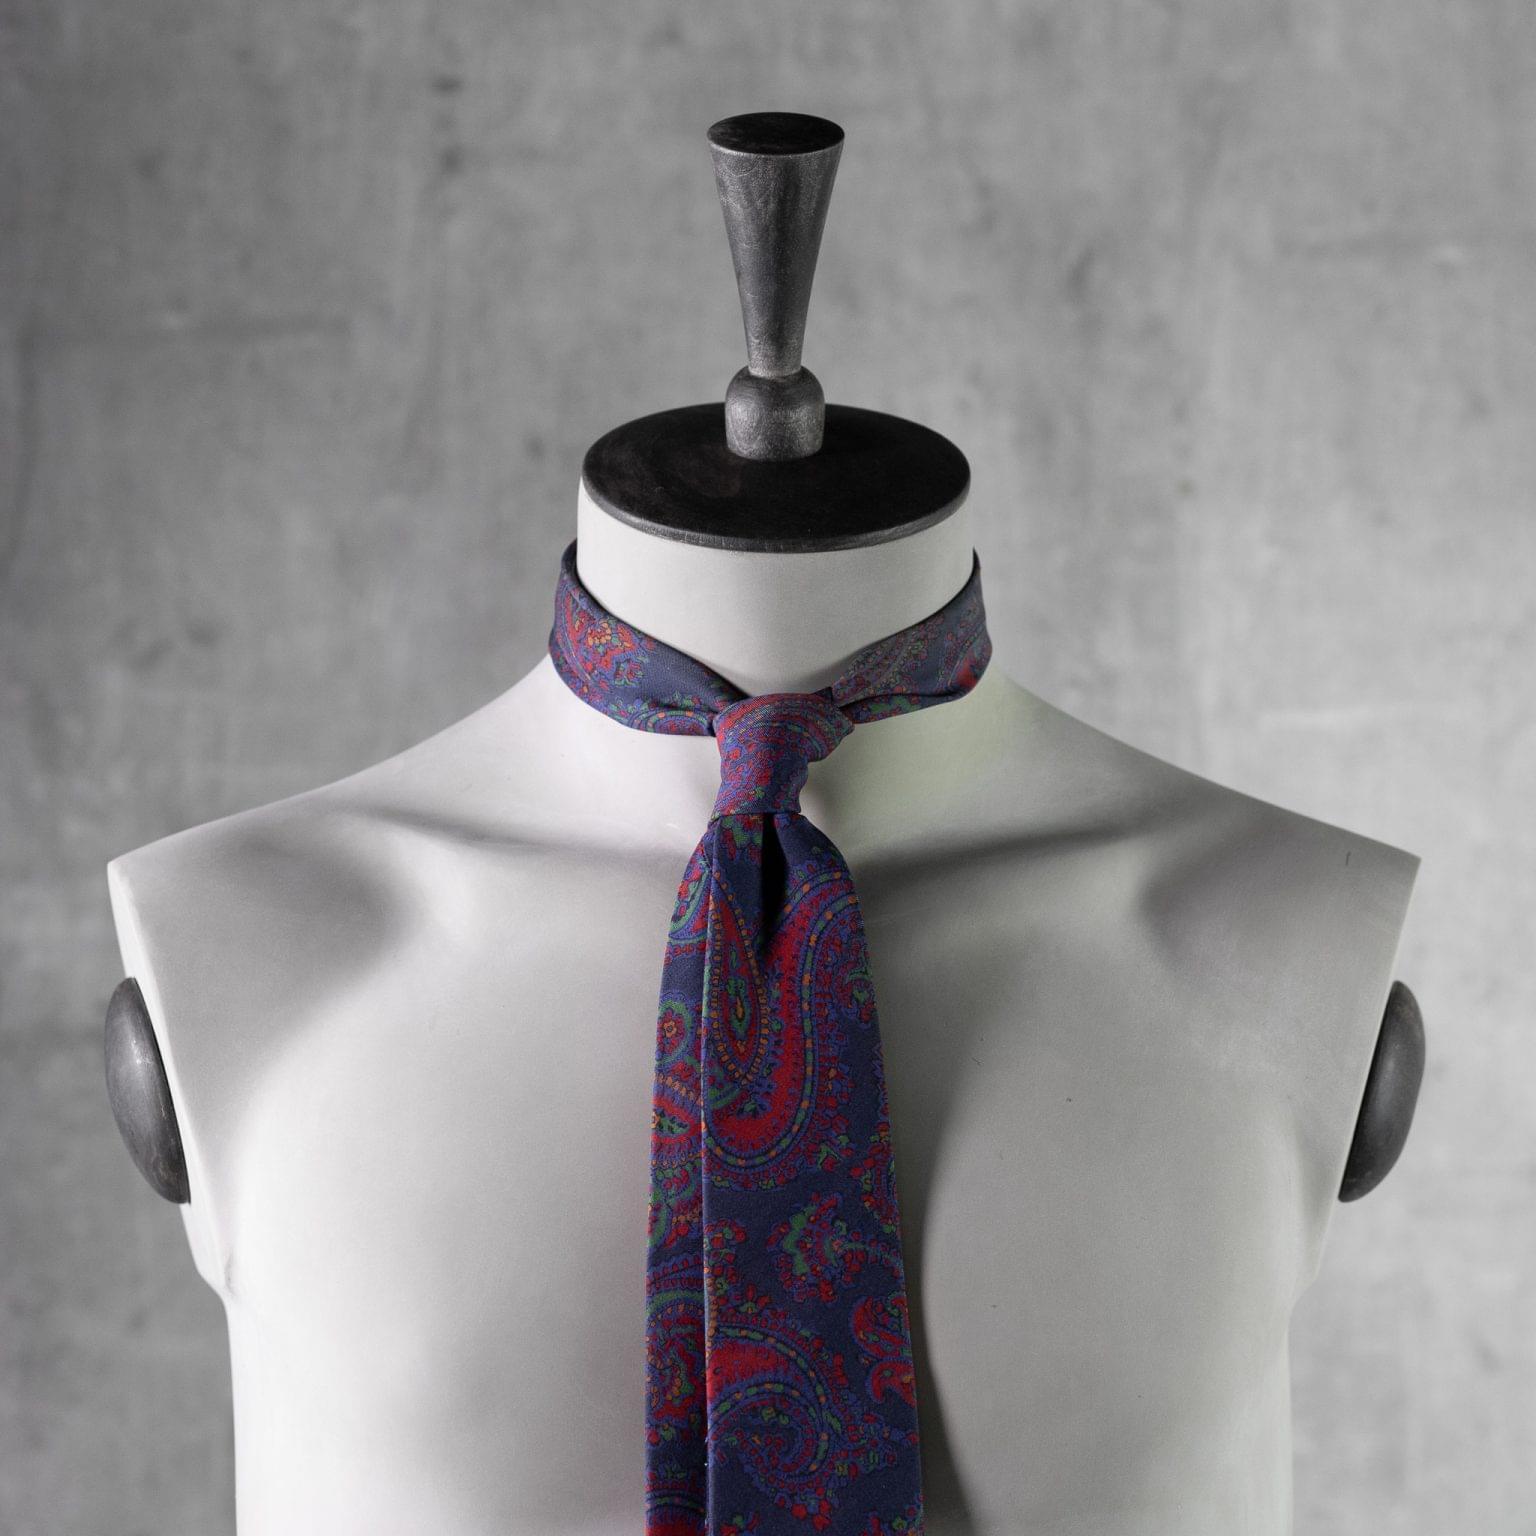 PRINTED-SILK-SEDA-ESTAMPADA-0437-Tie-Initials-Corbata-Iniciales-The-Seelk-3